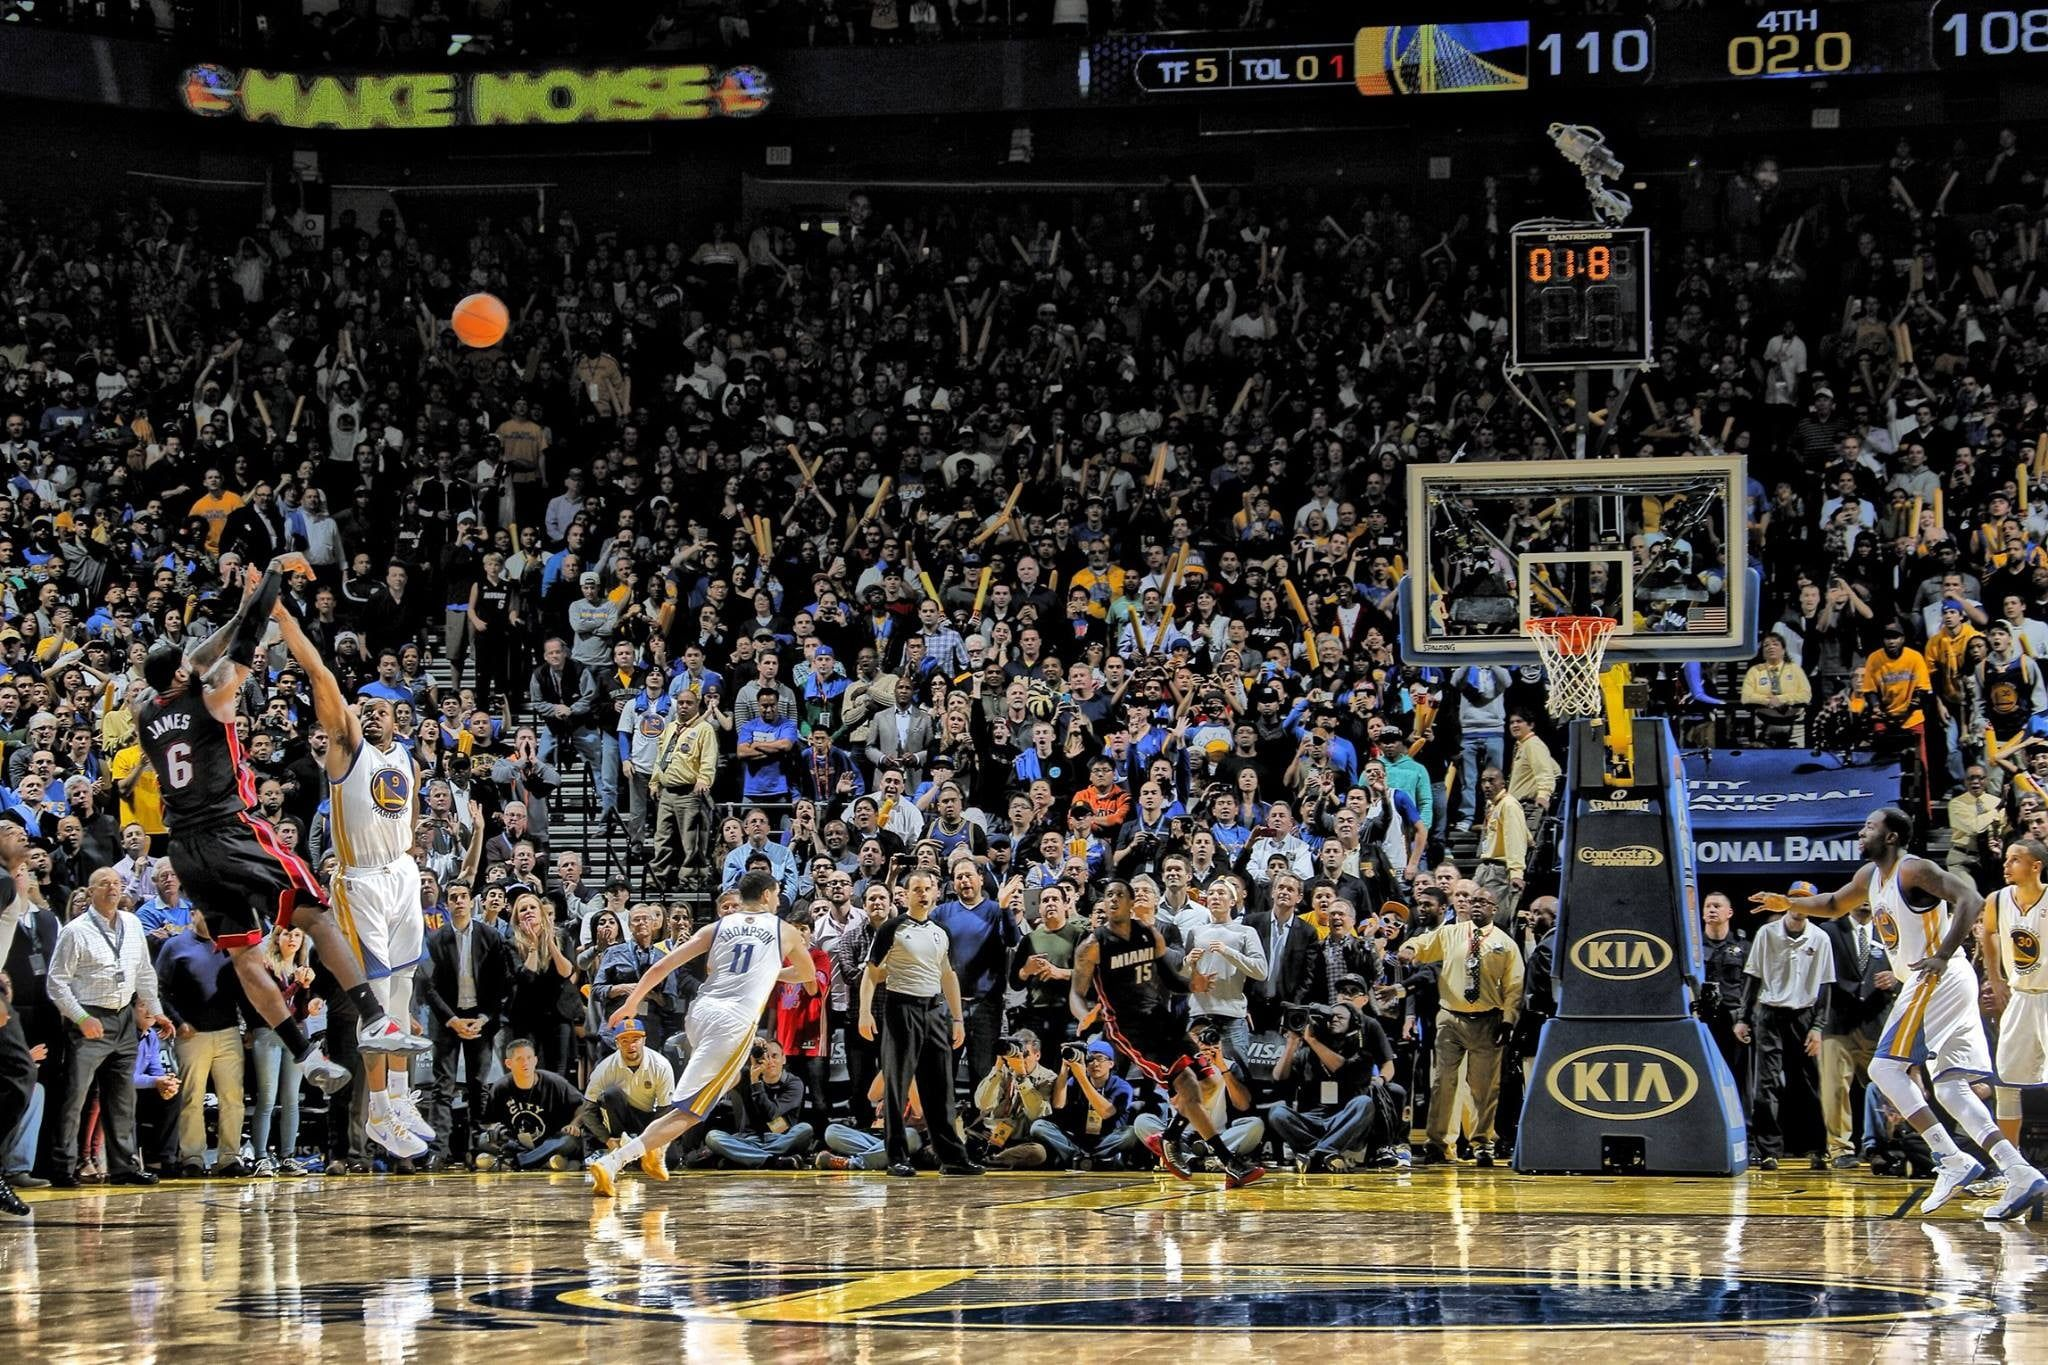 Nba Lebron James Basketball Miami Heat 1080p Wallpaper Hdwallpaper Desktop In 2020 Lebron James Lebron James Background Lebron James Miami Heat